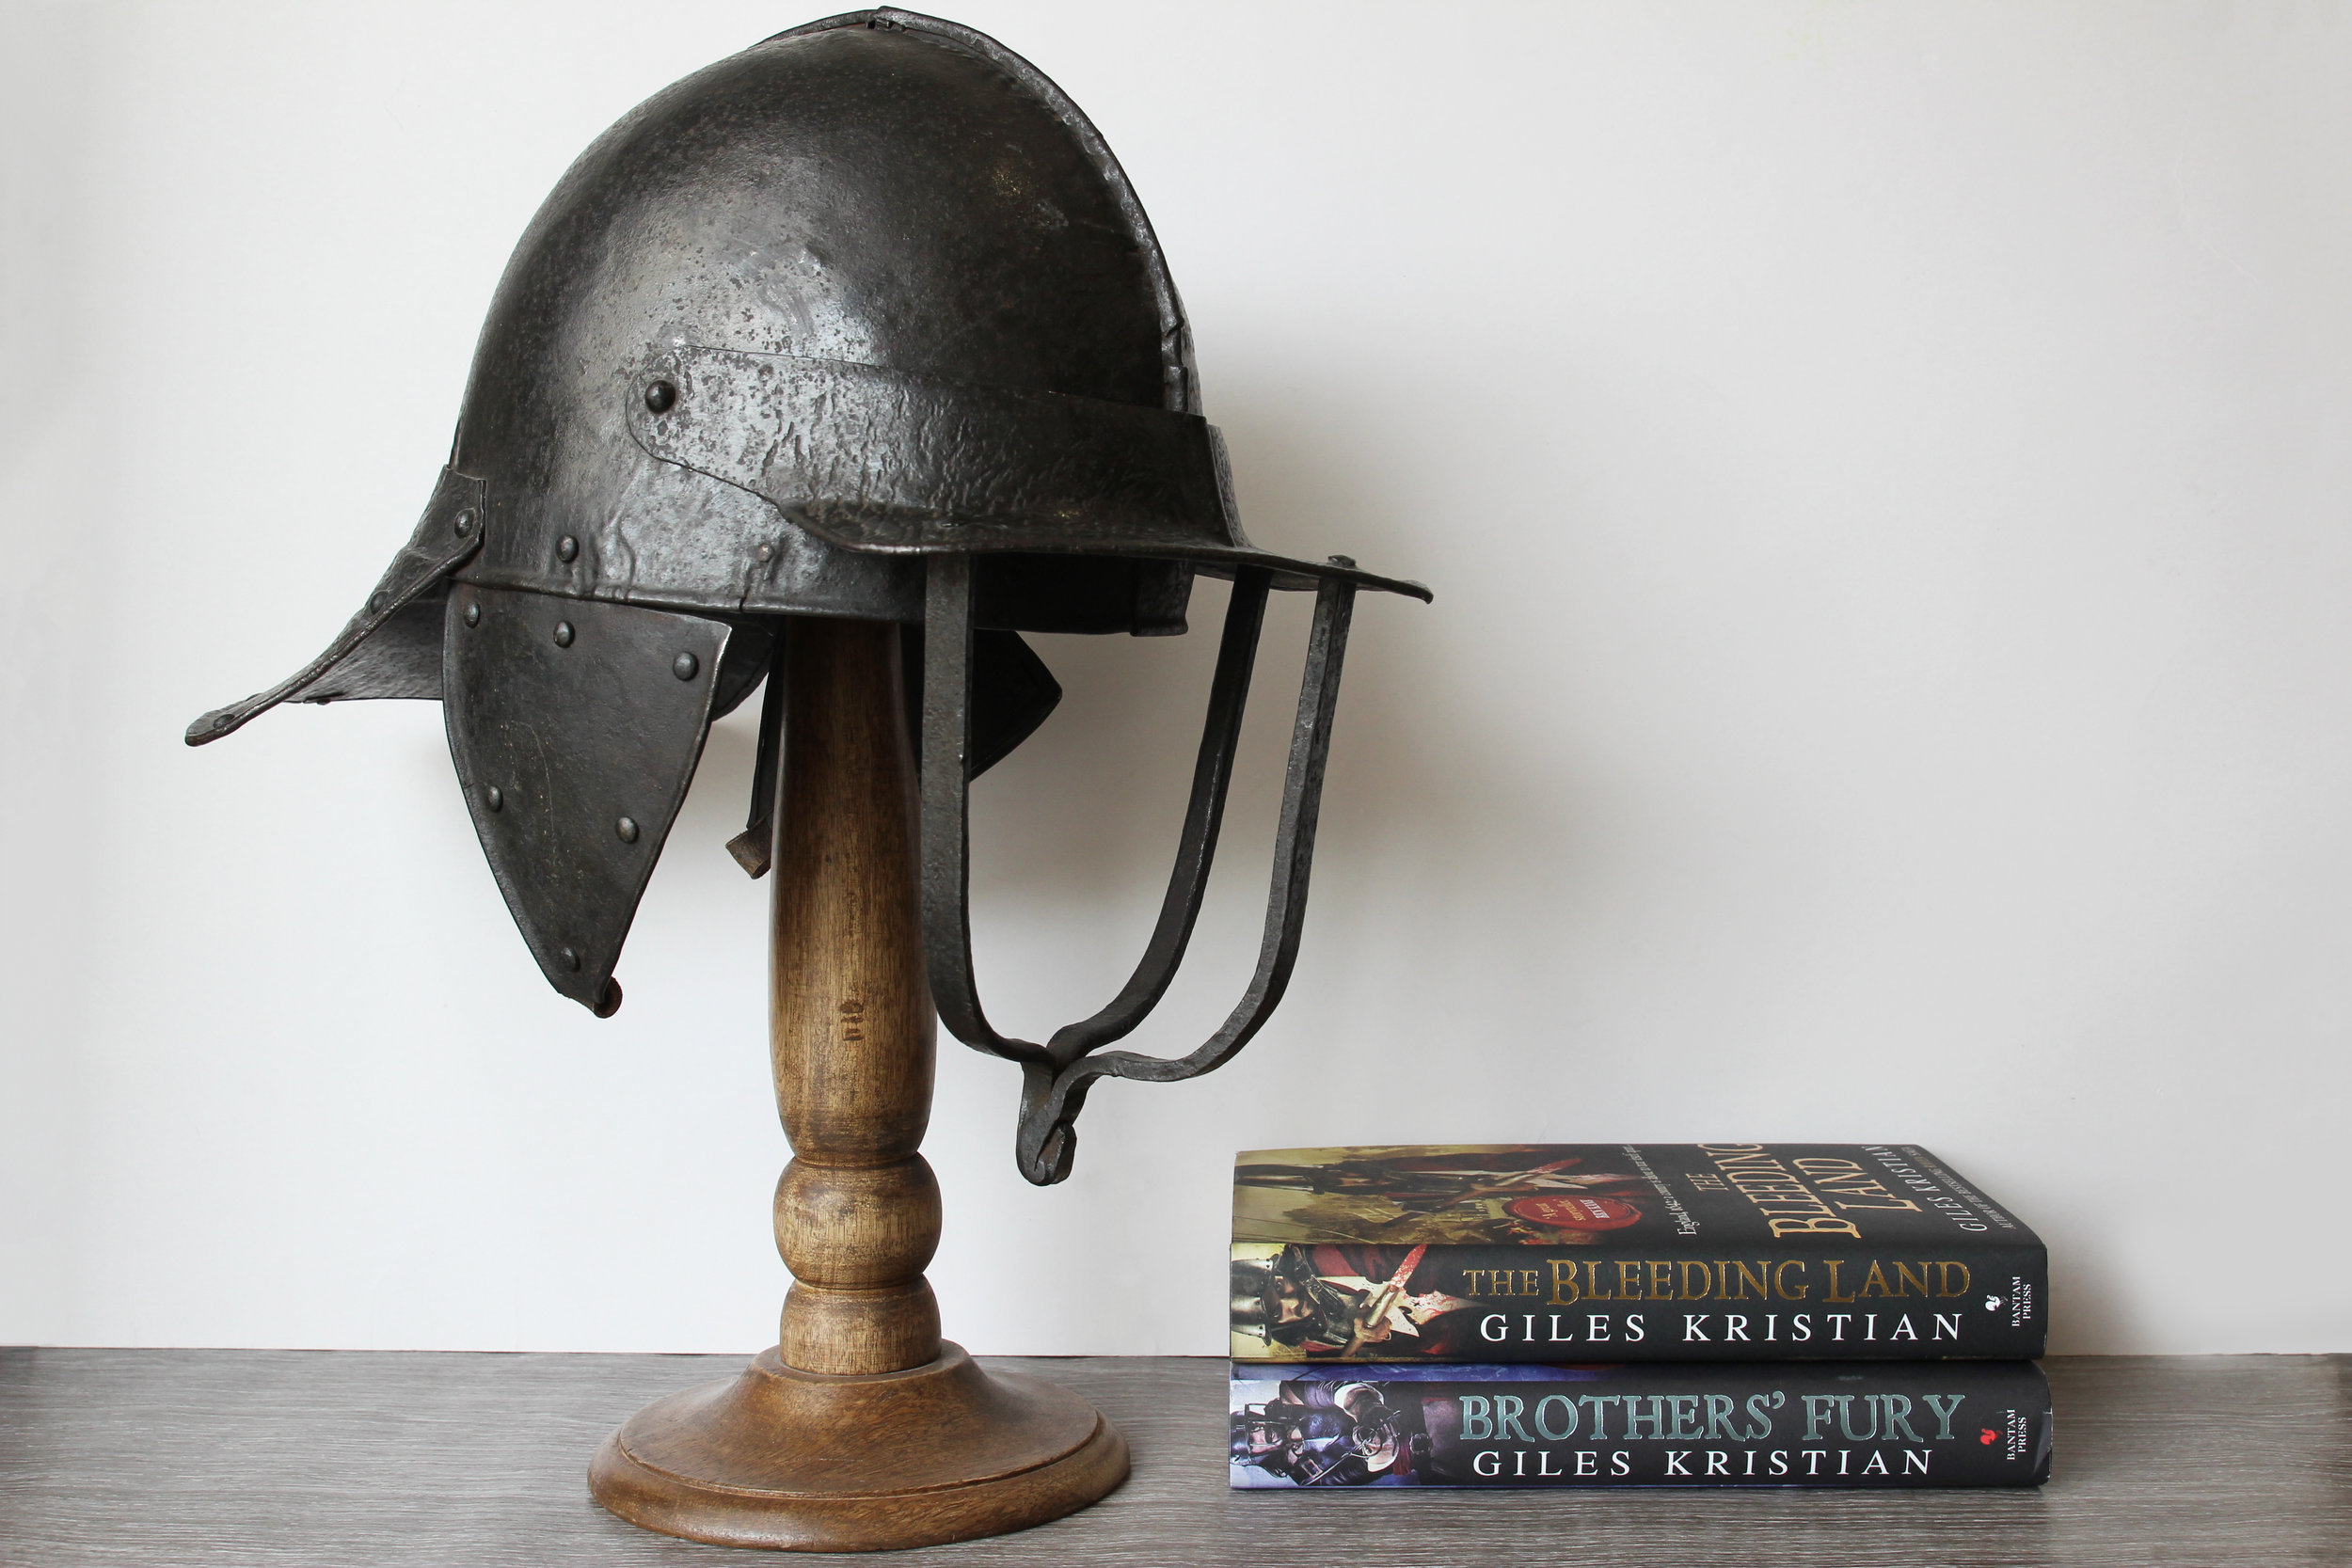 The Bleeding Land, civil war novel by Giles Kristian